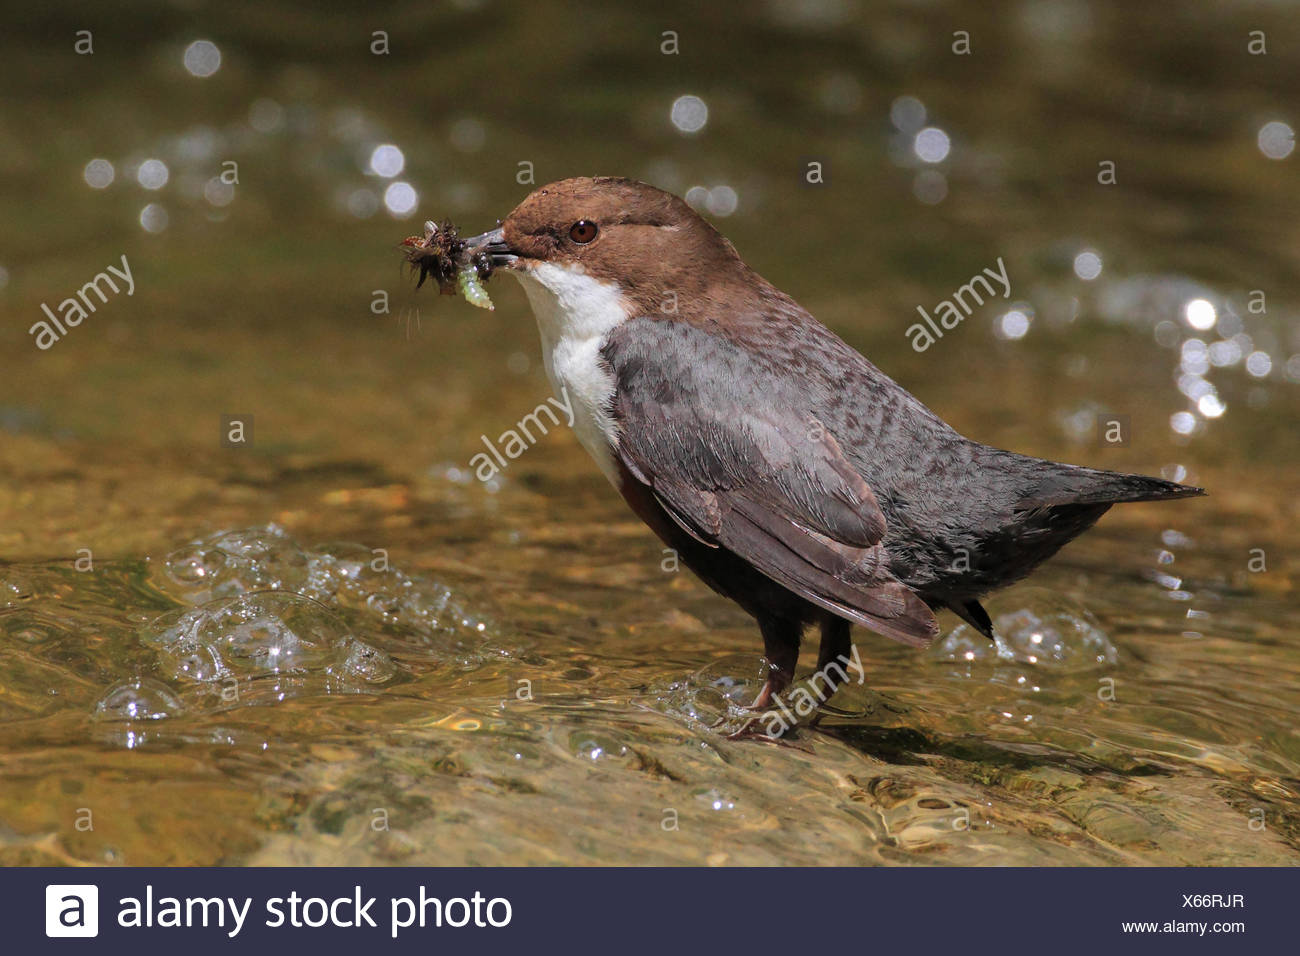 Creek, brook bed, Cinclus cinclus, eat, Eurasian, common dipper, dipper, fauna, riverbed, spring, feed, feeding, food, nature, u - Stock Image